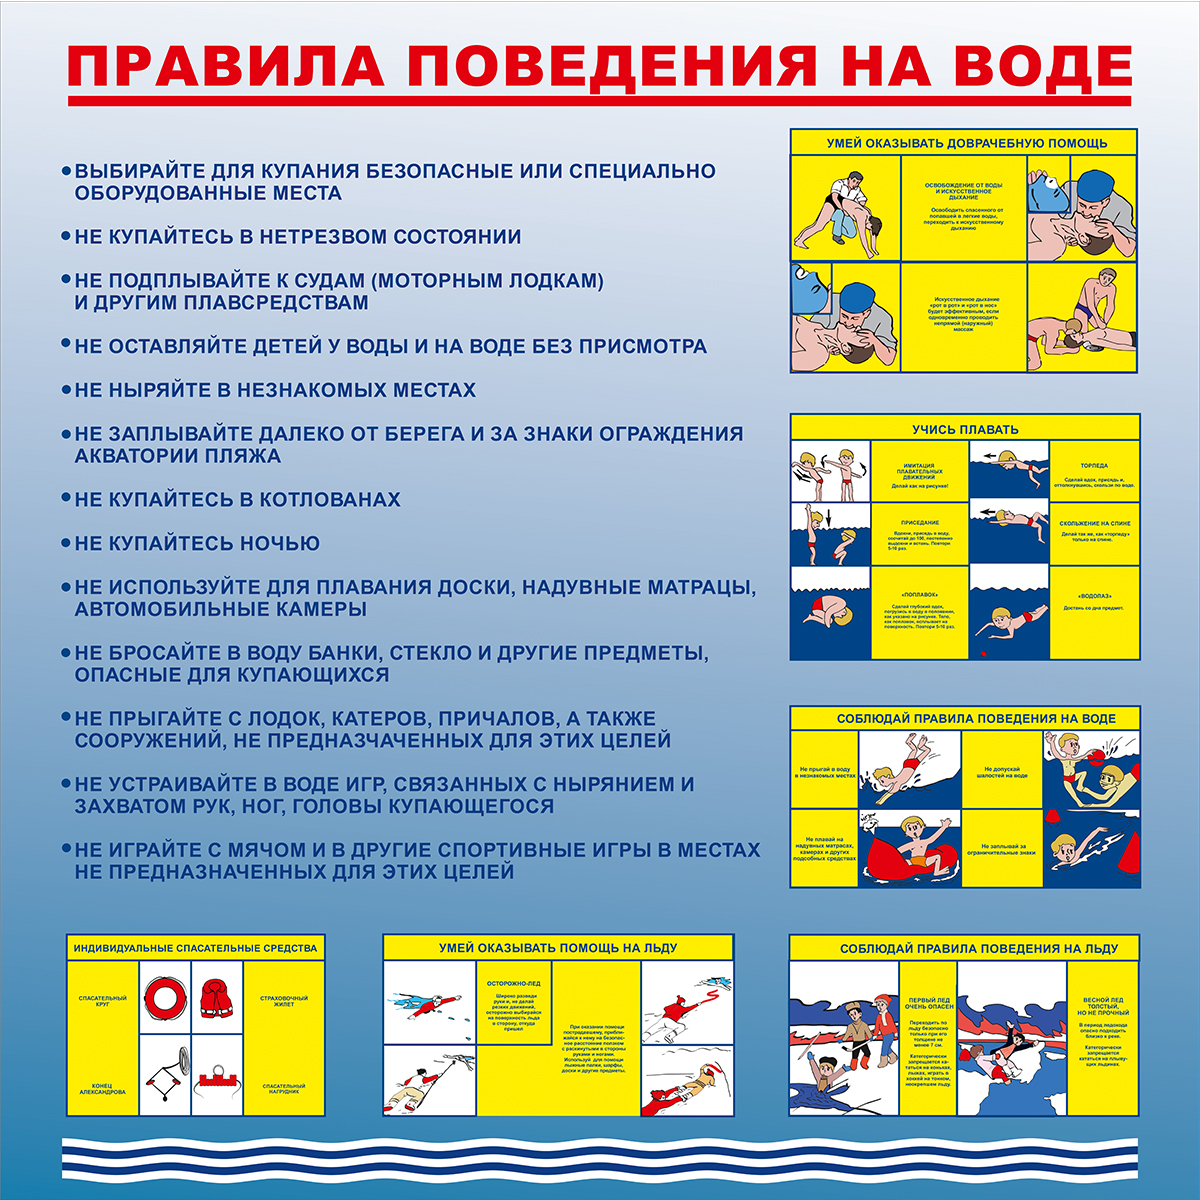 Правила поведения на воде  1000х1000 мм